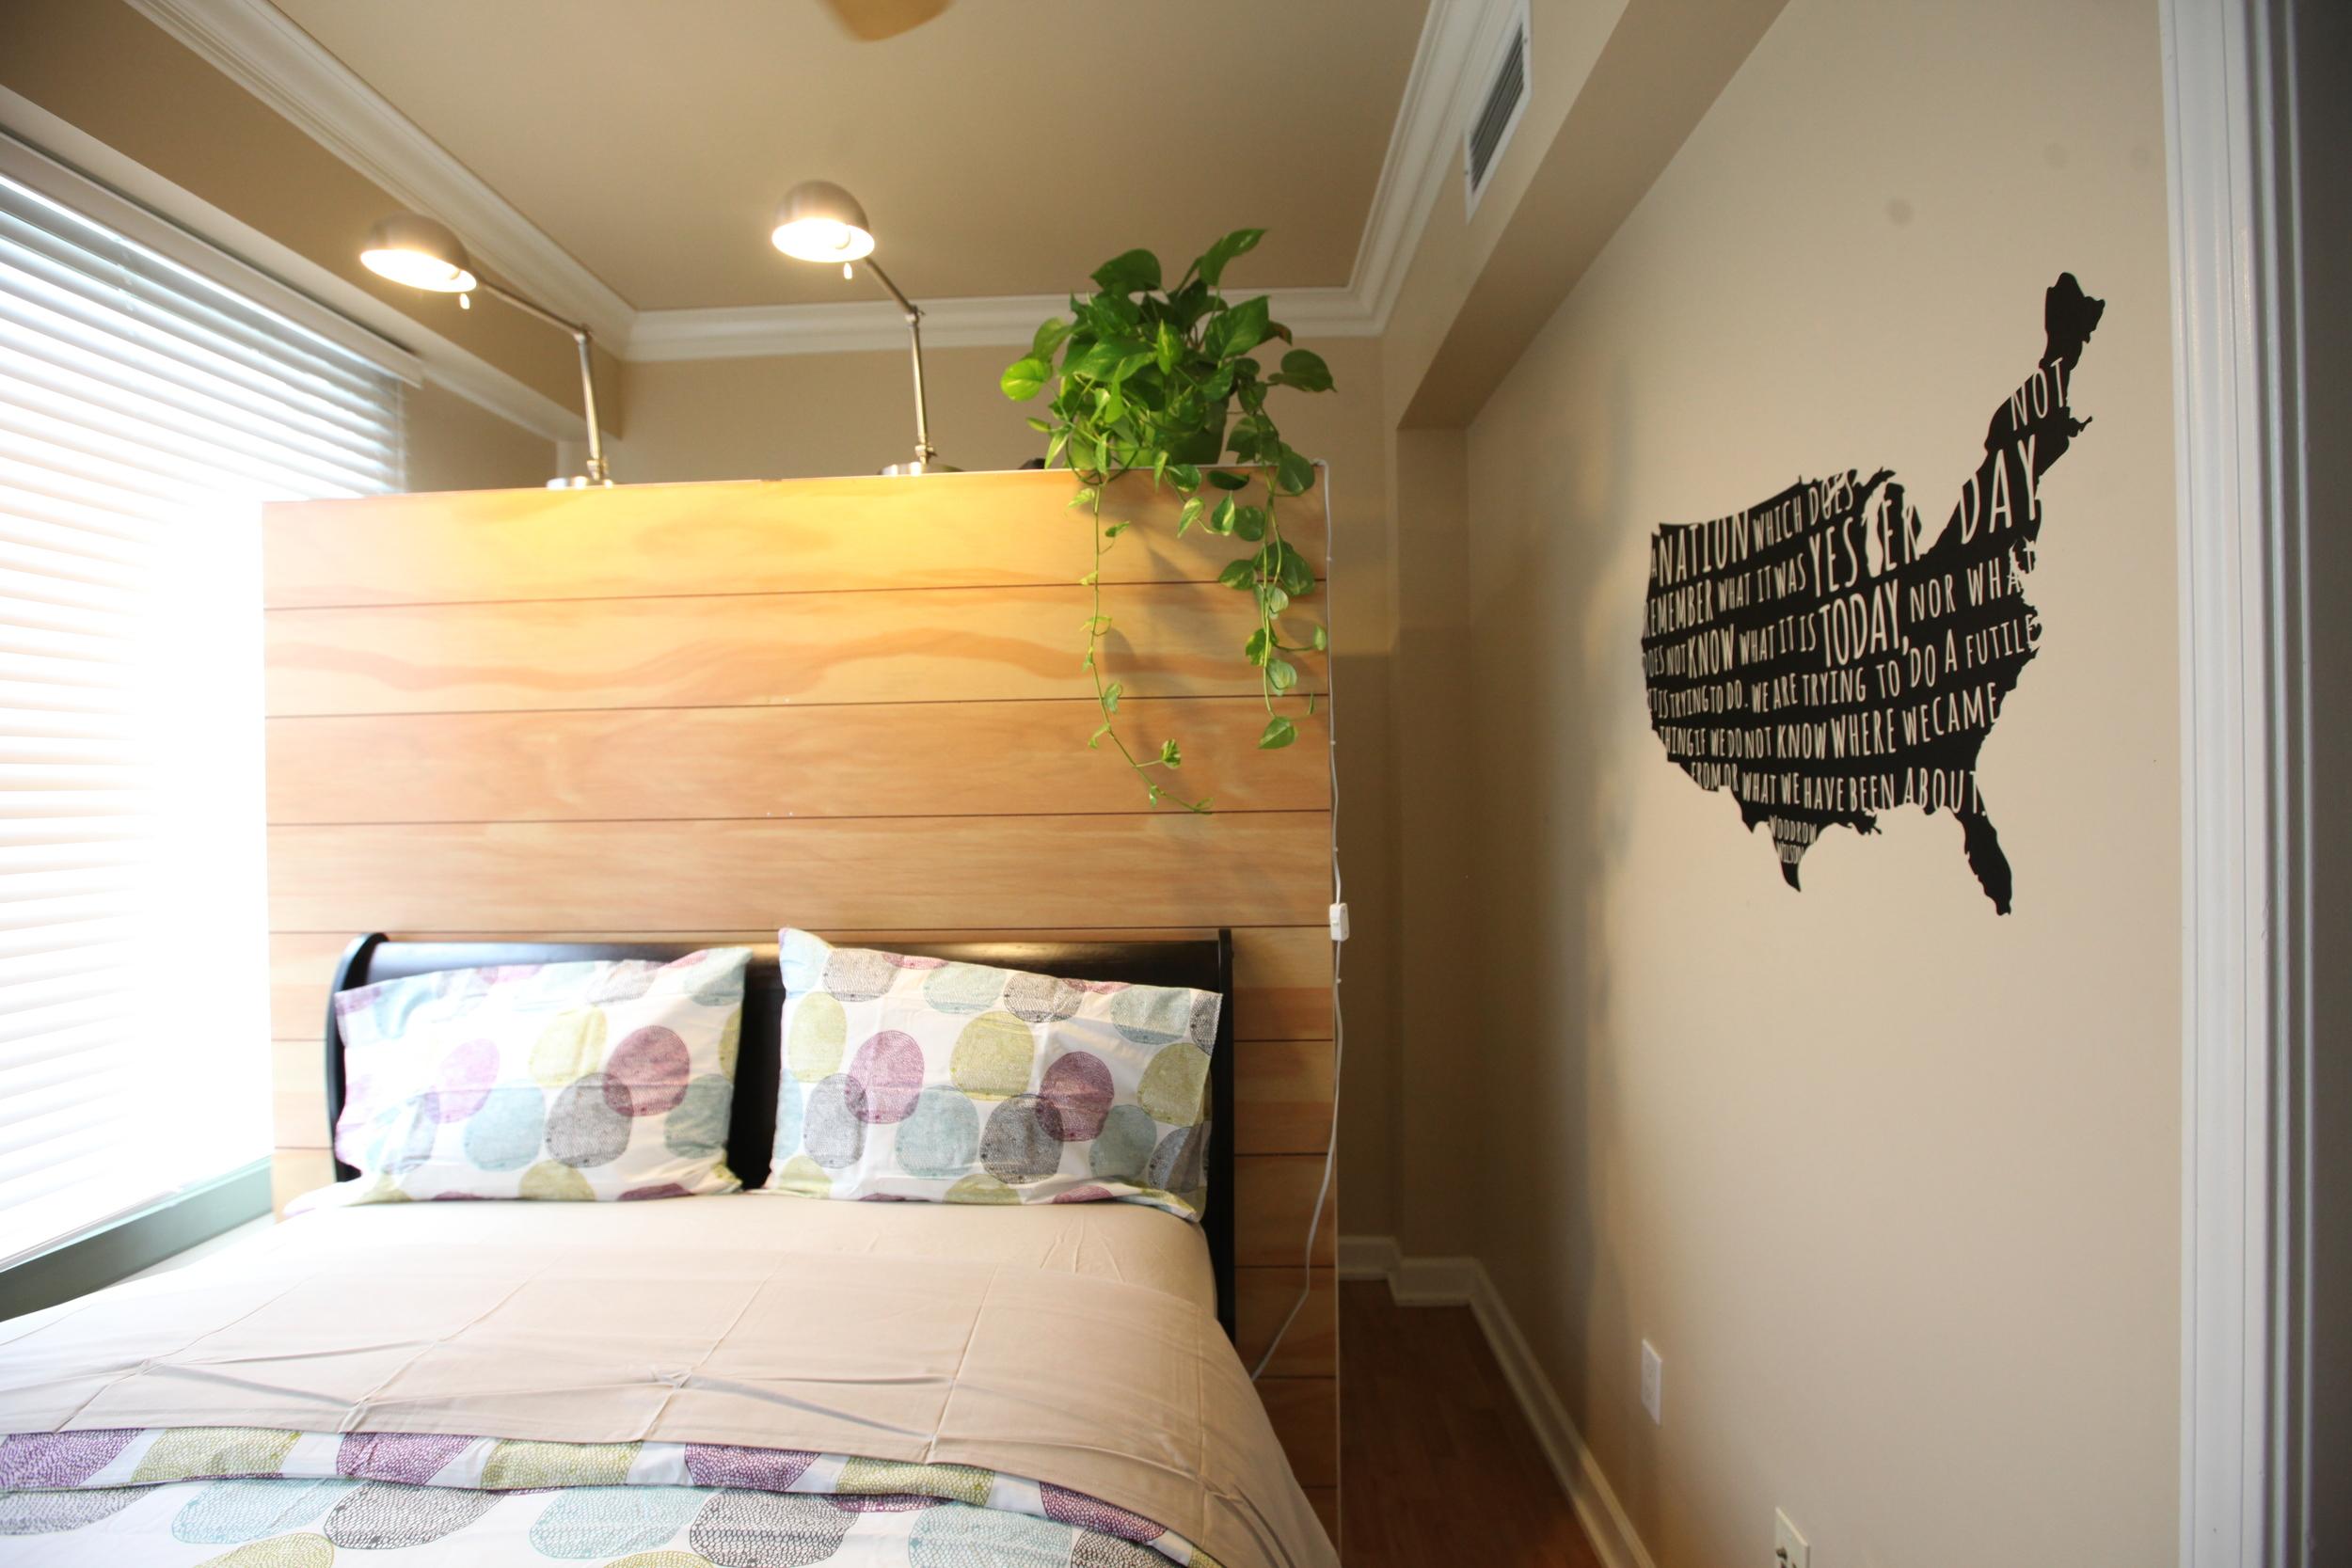 Unit 620 Bedroom